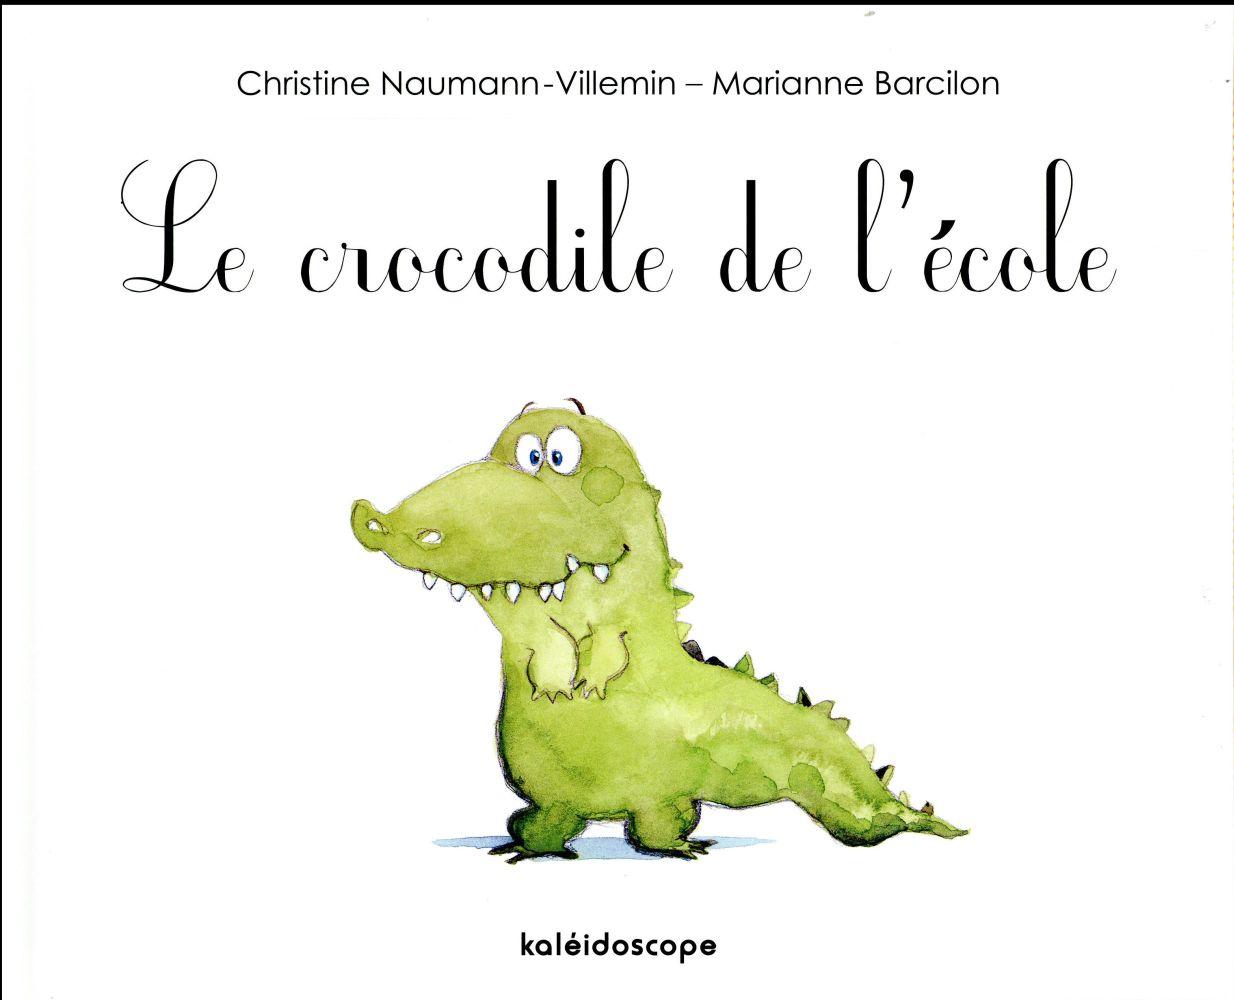 LE CROCODILE DE L ECOLE